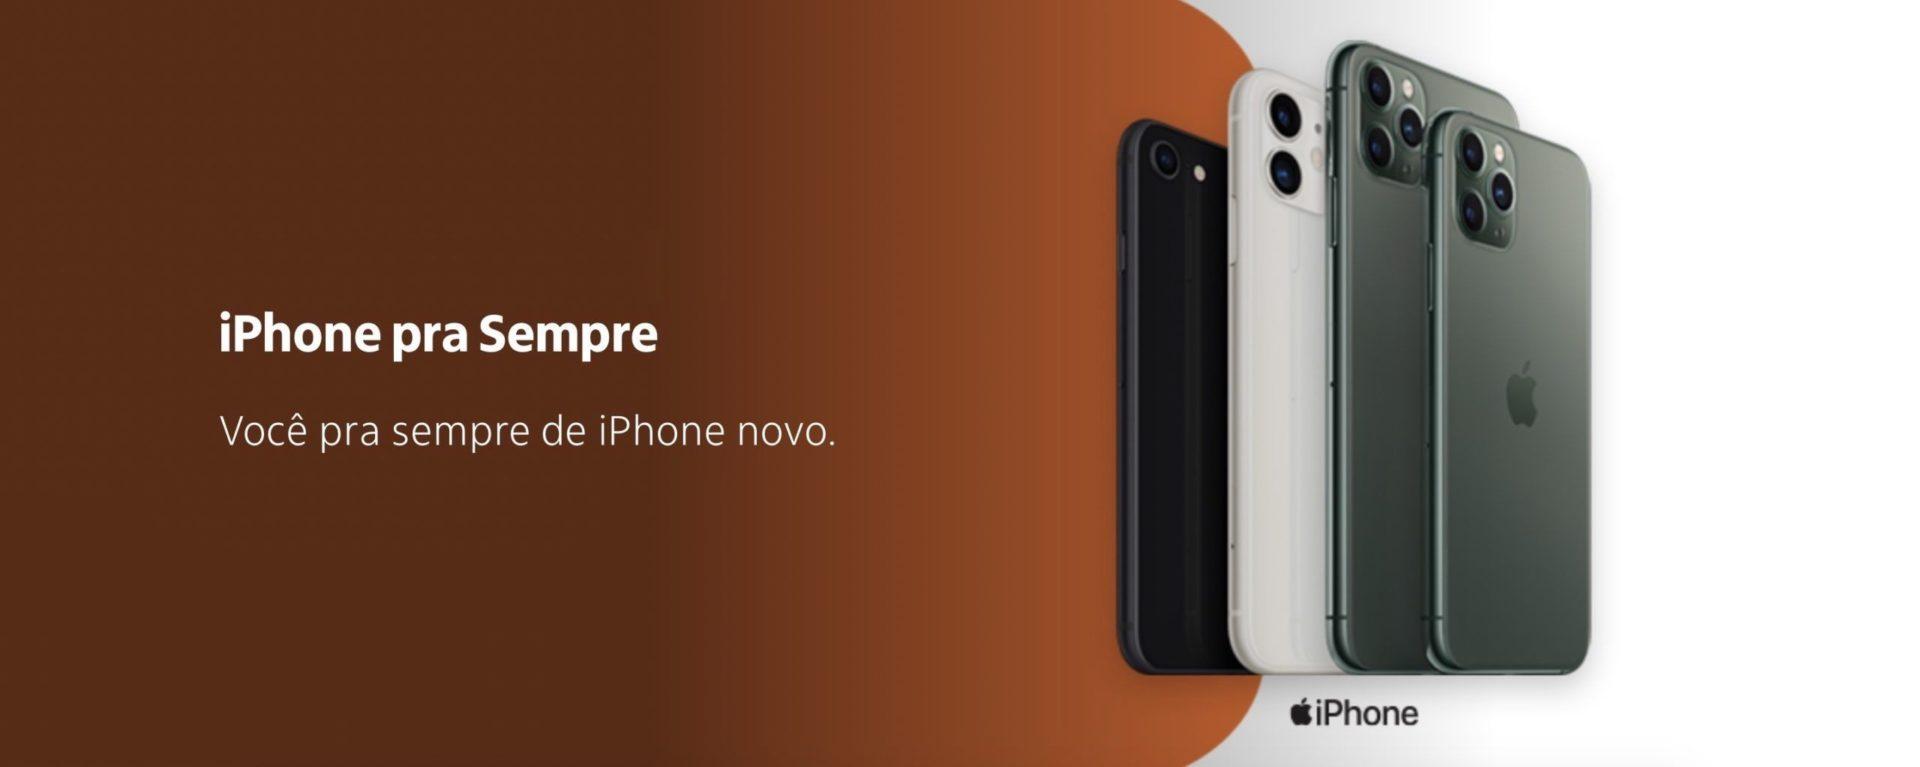 Itaú iPhone pra Sempre